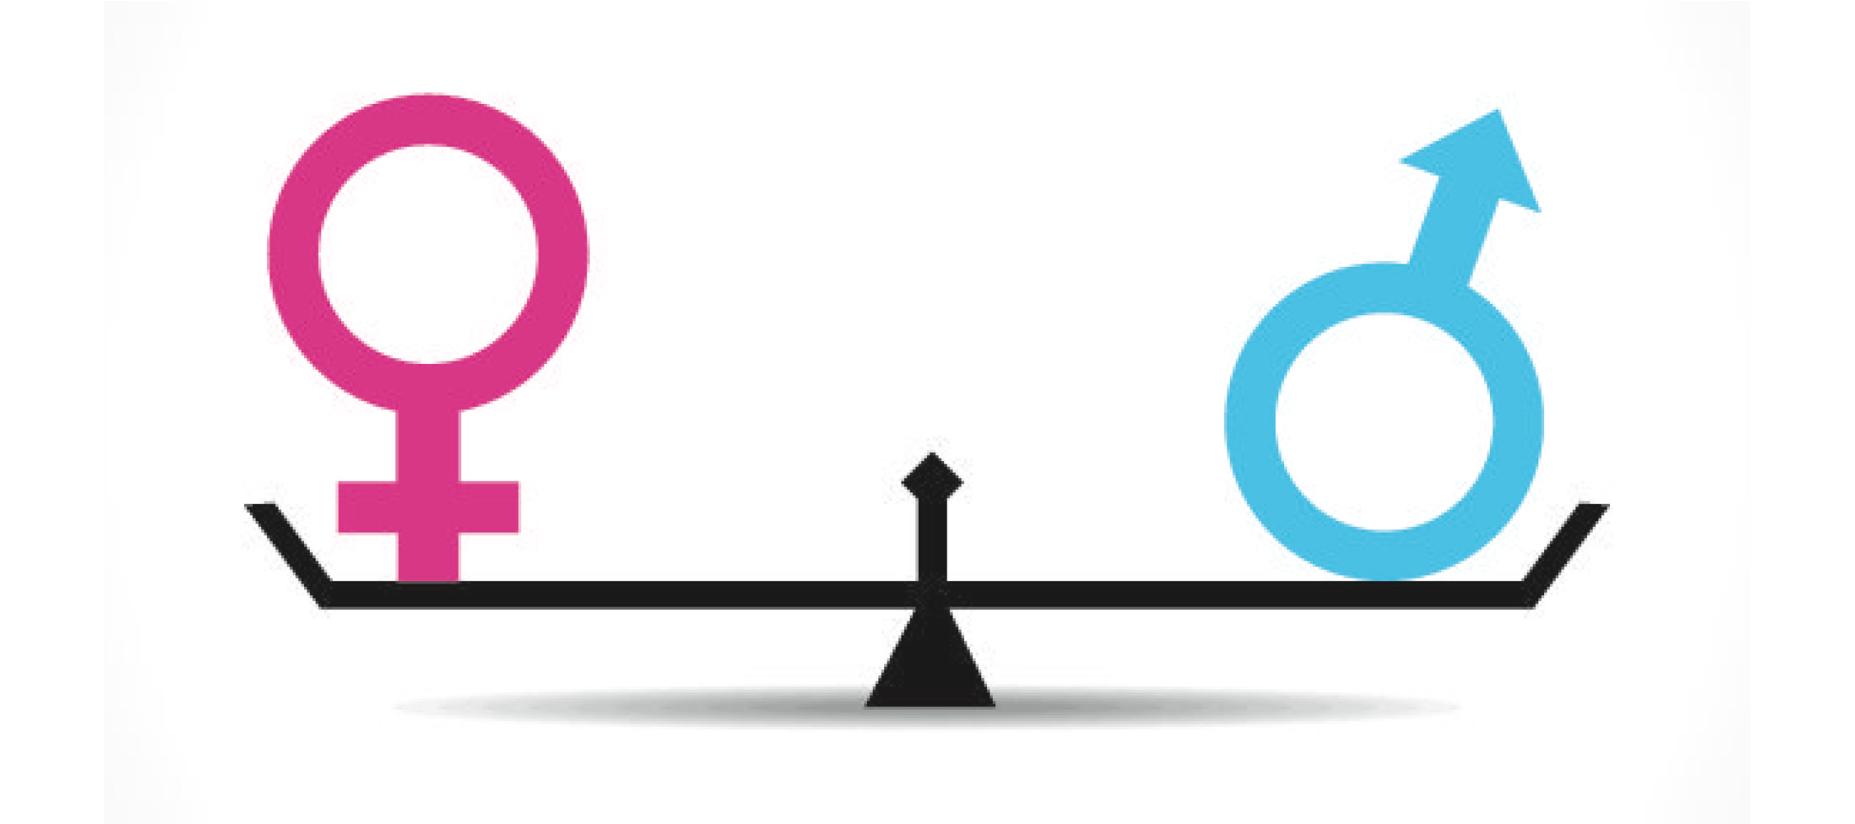 KTH is striving for gender equality.